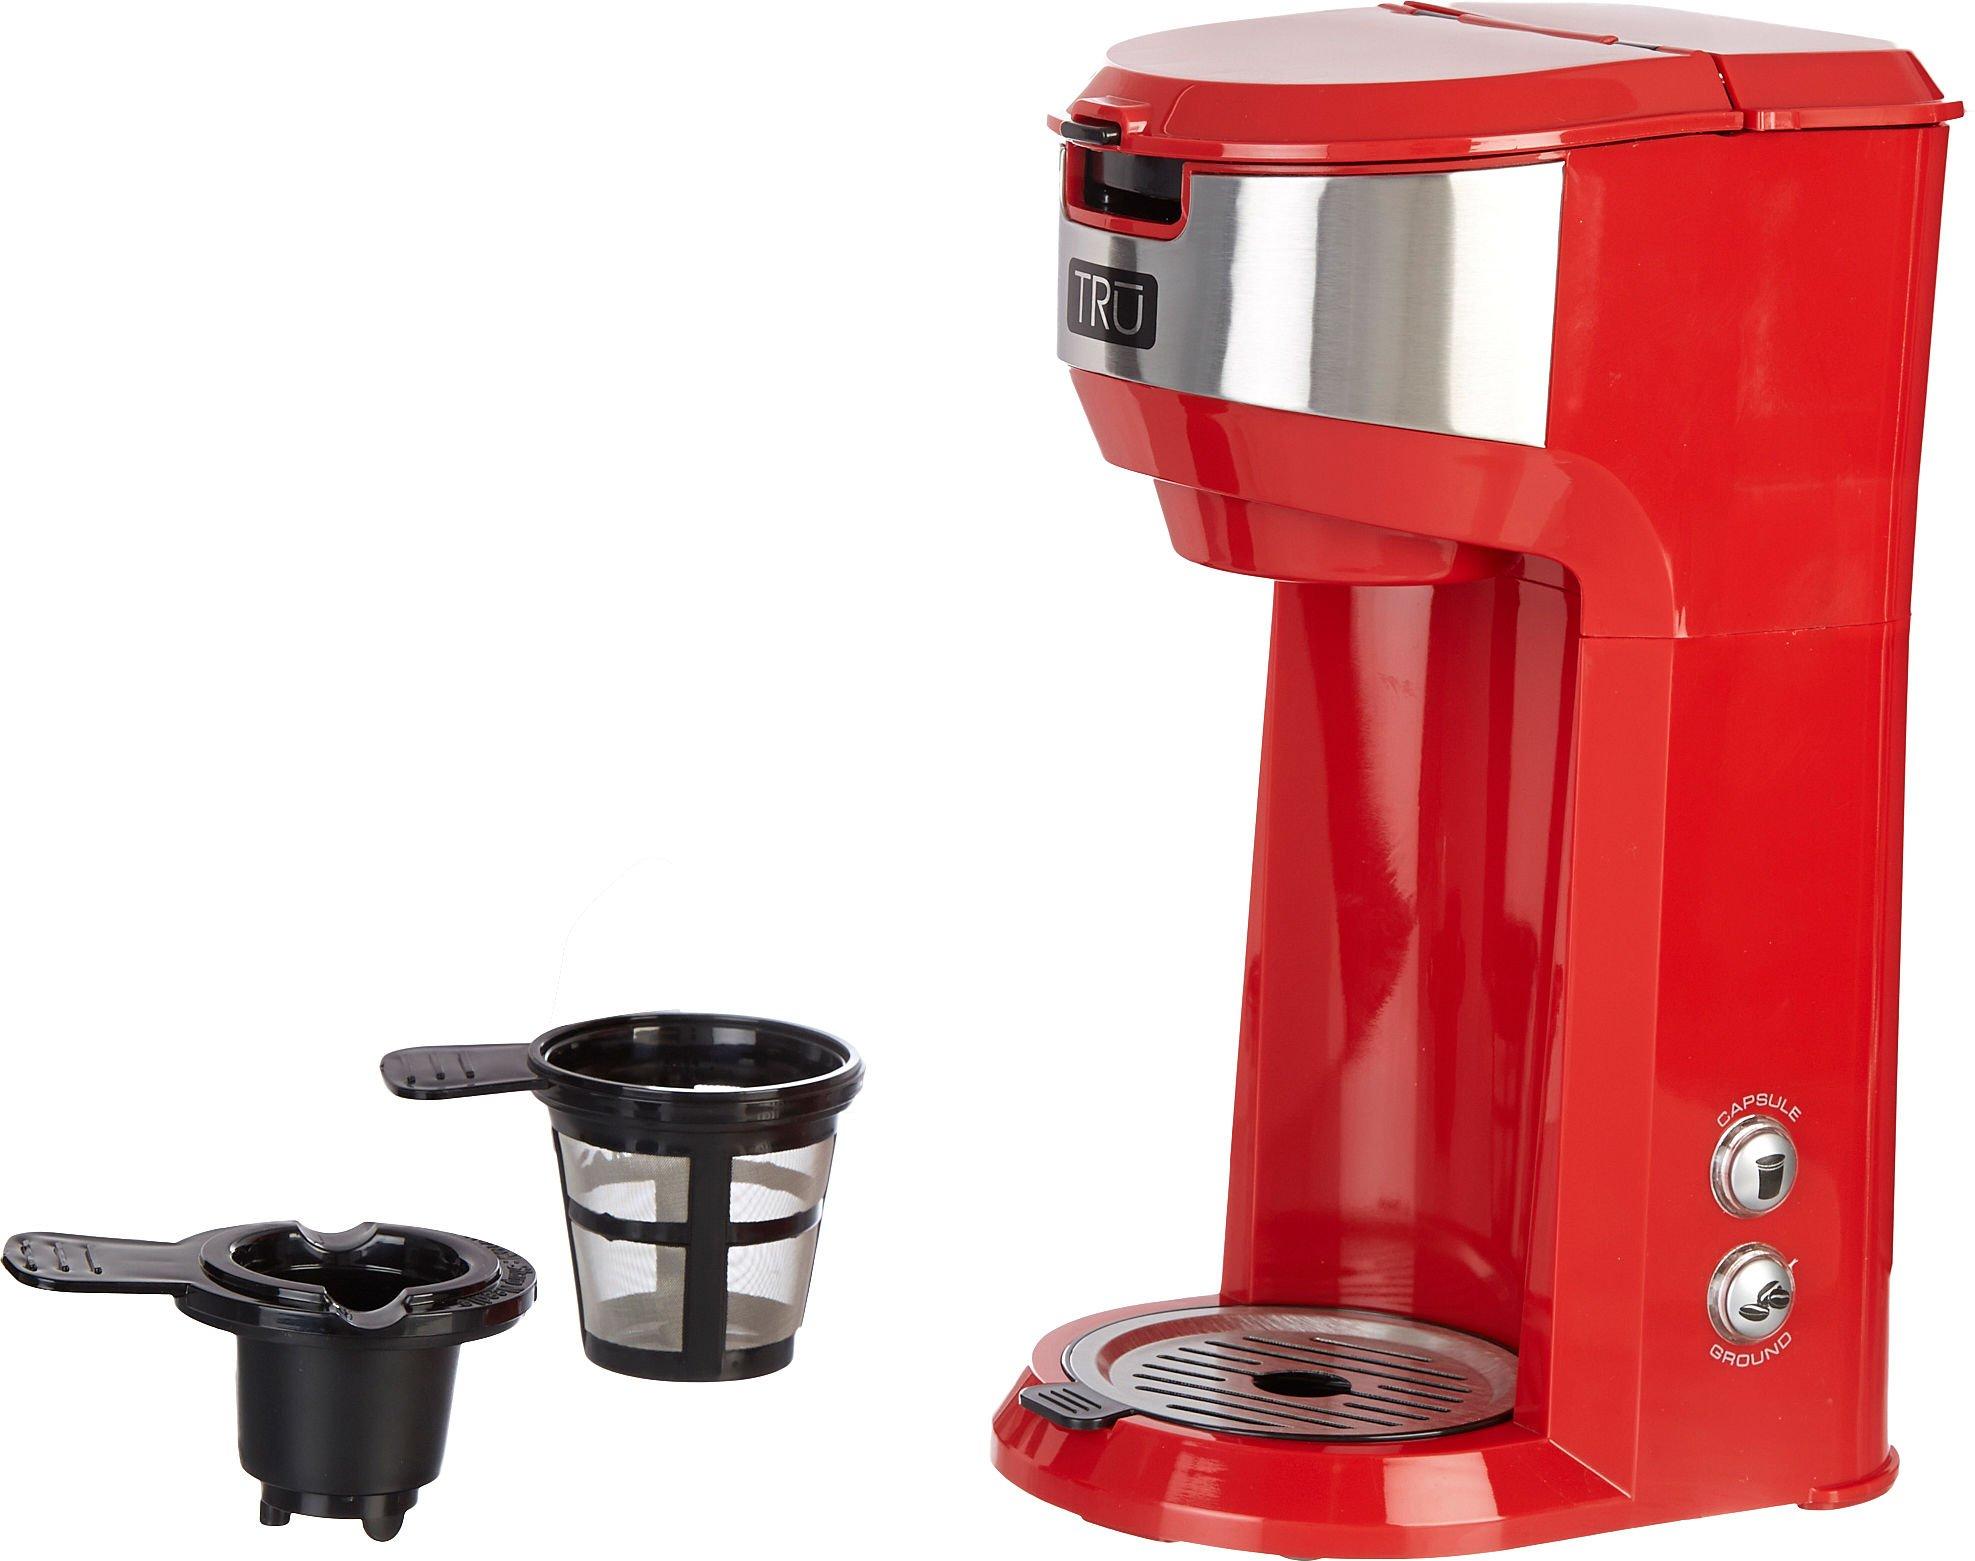 TRU Dual Single Serve Coffee Maker - Red (CM-1177RD) by Tru